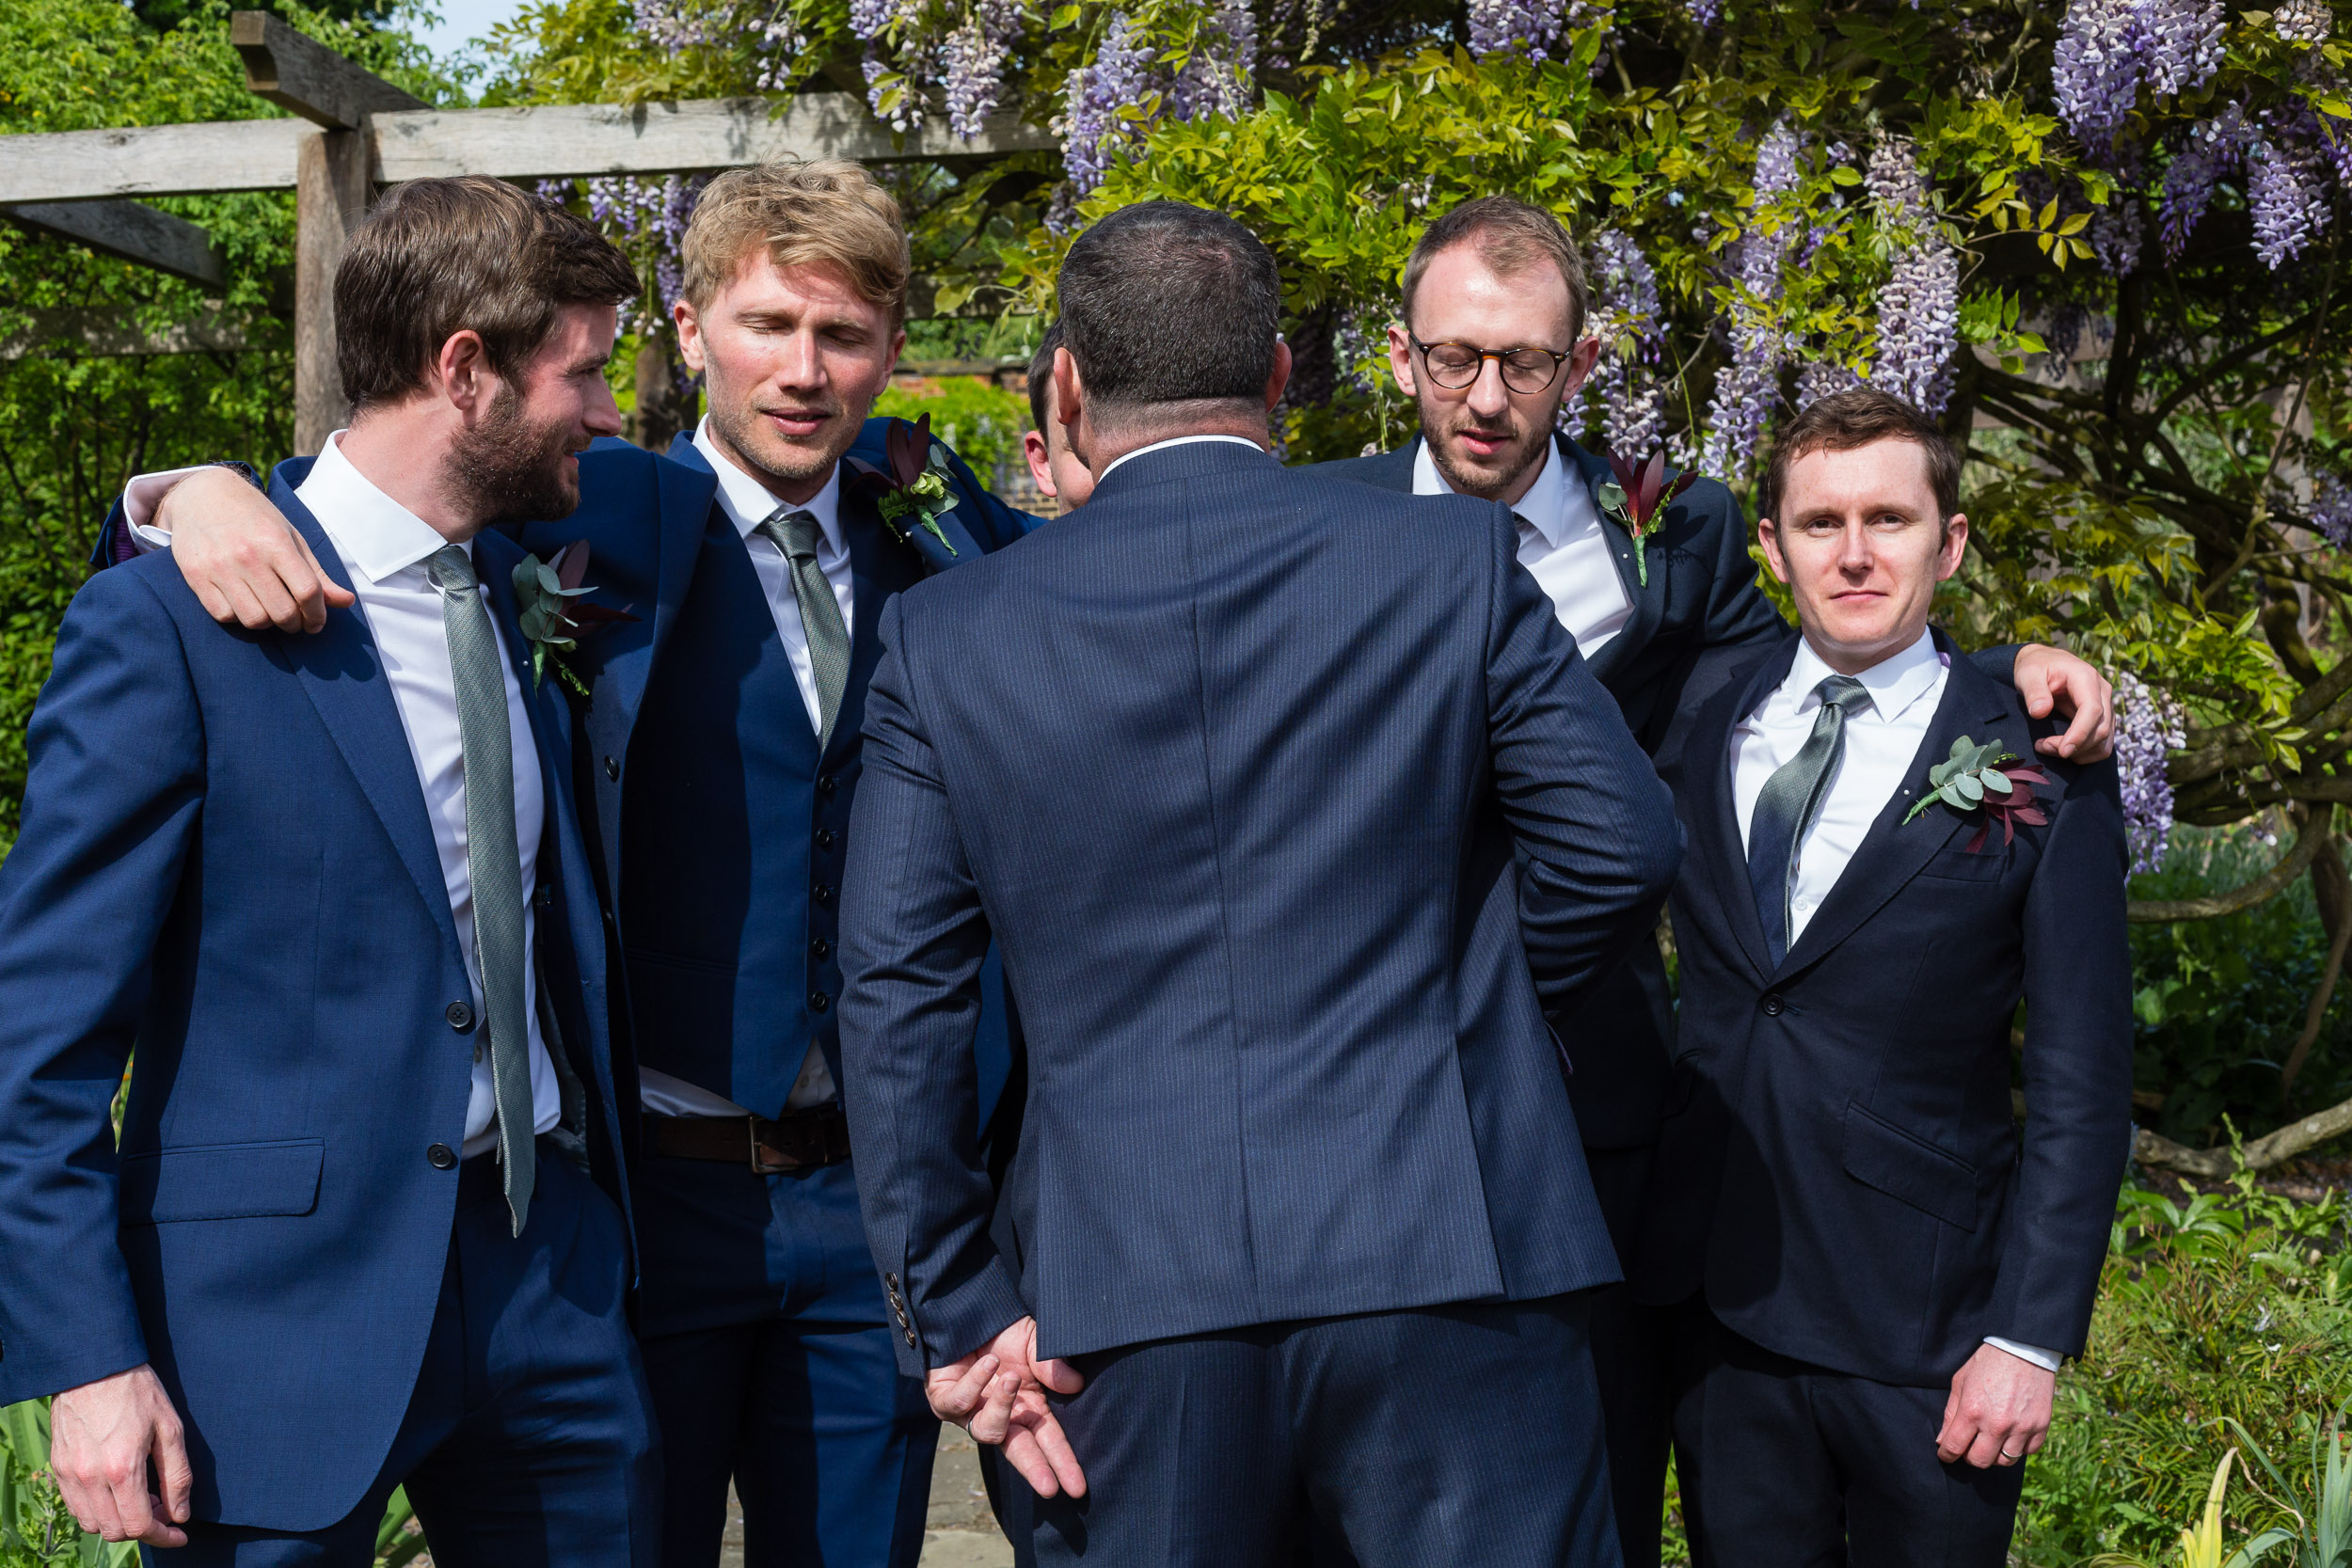 brockwell-lido-brixton-herne-hill-wedding-266.jpg